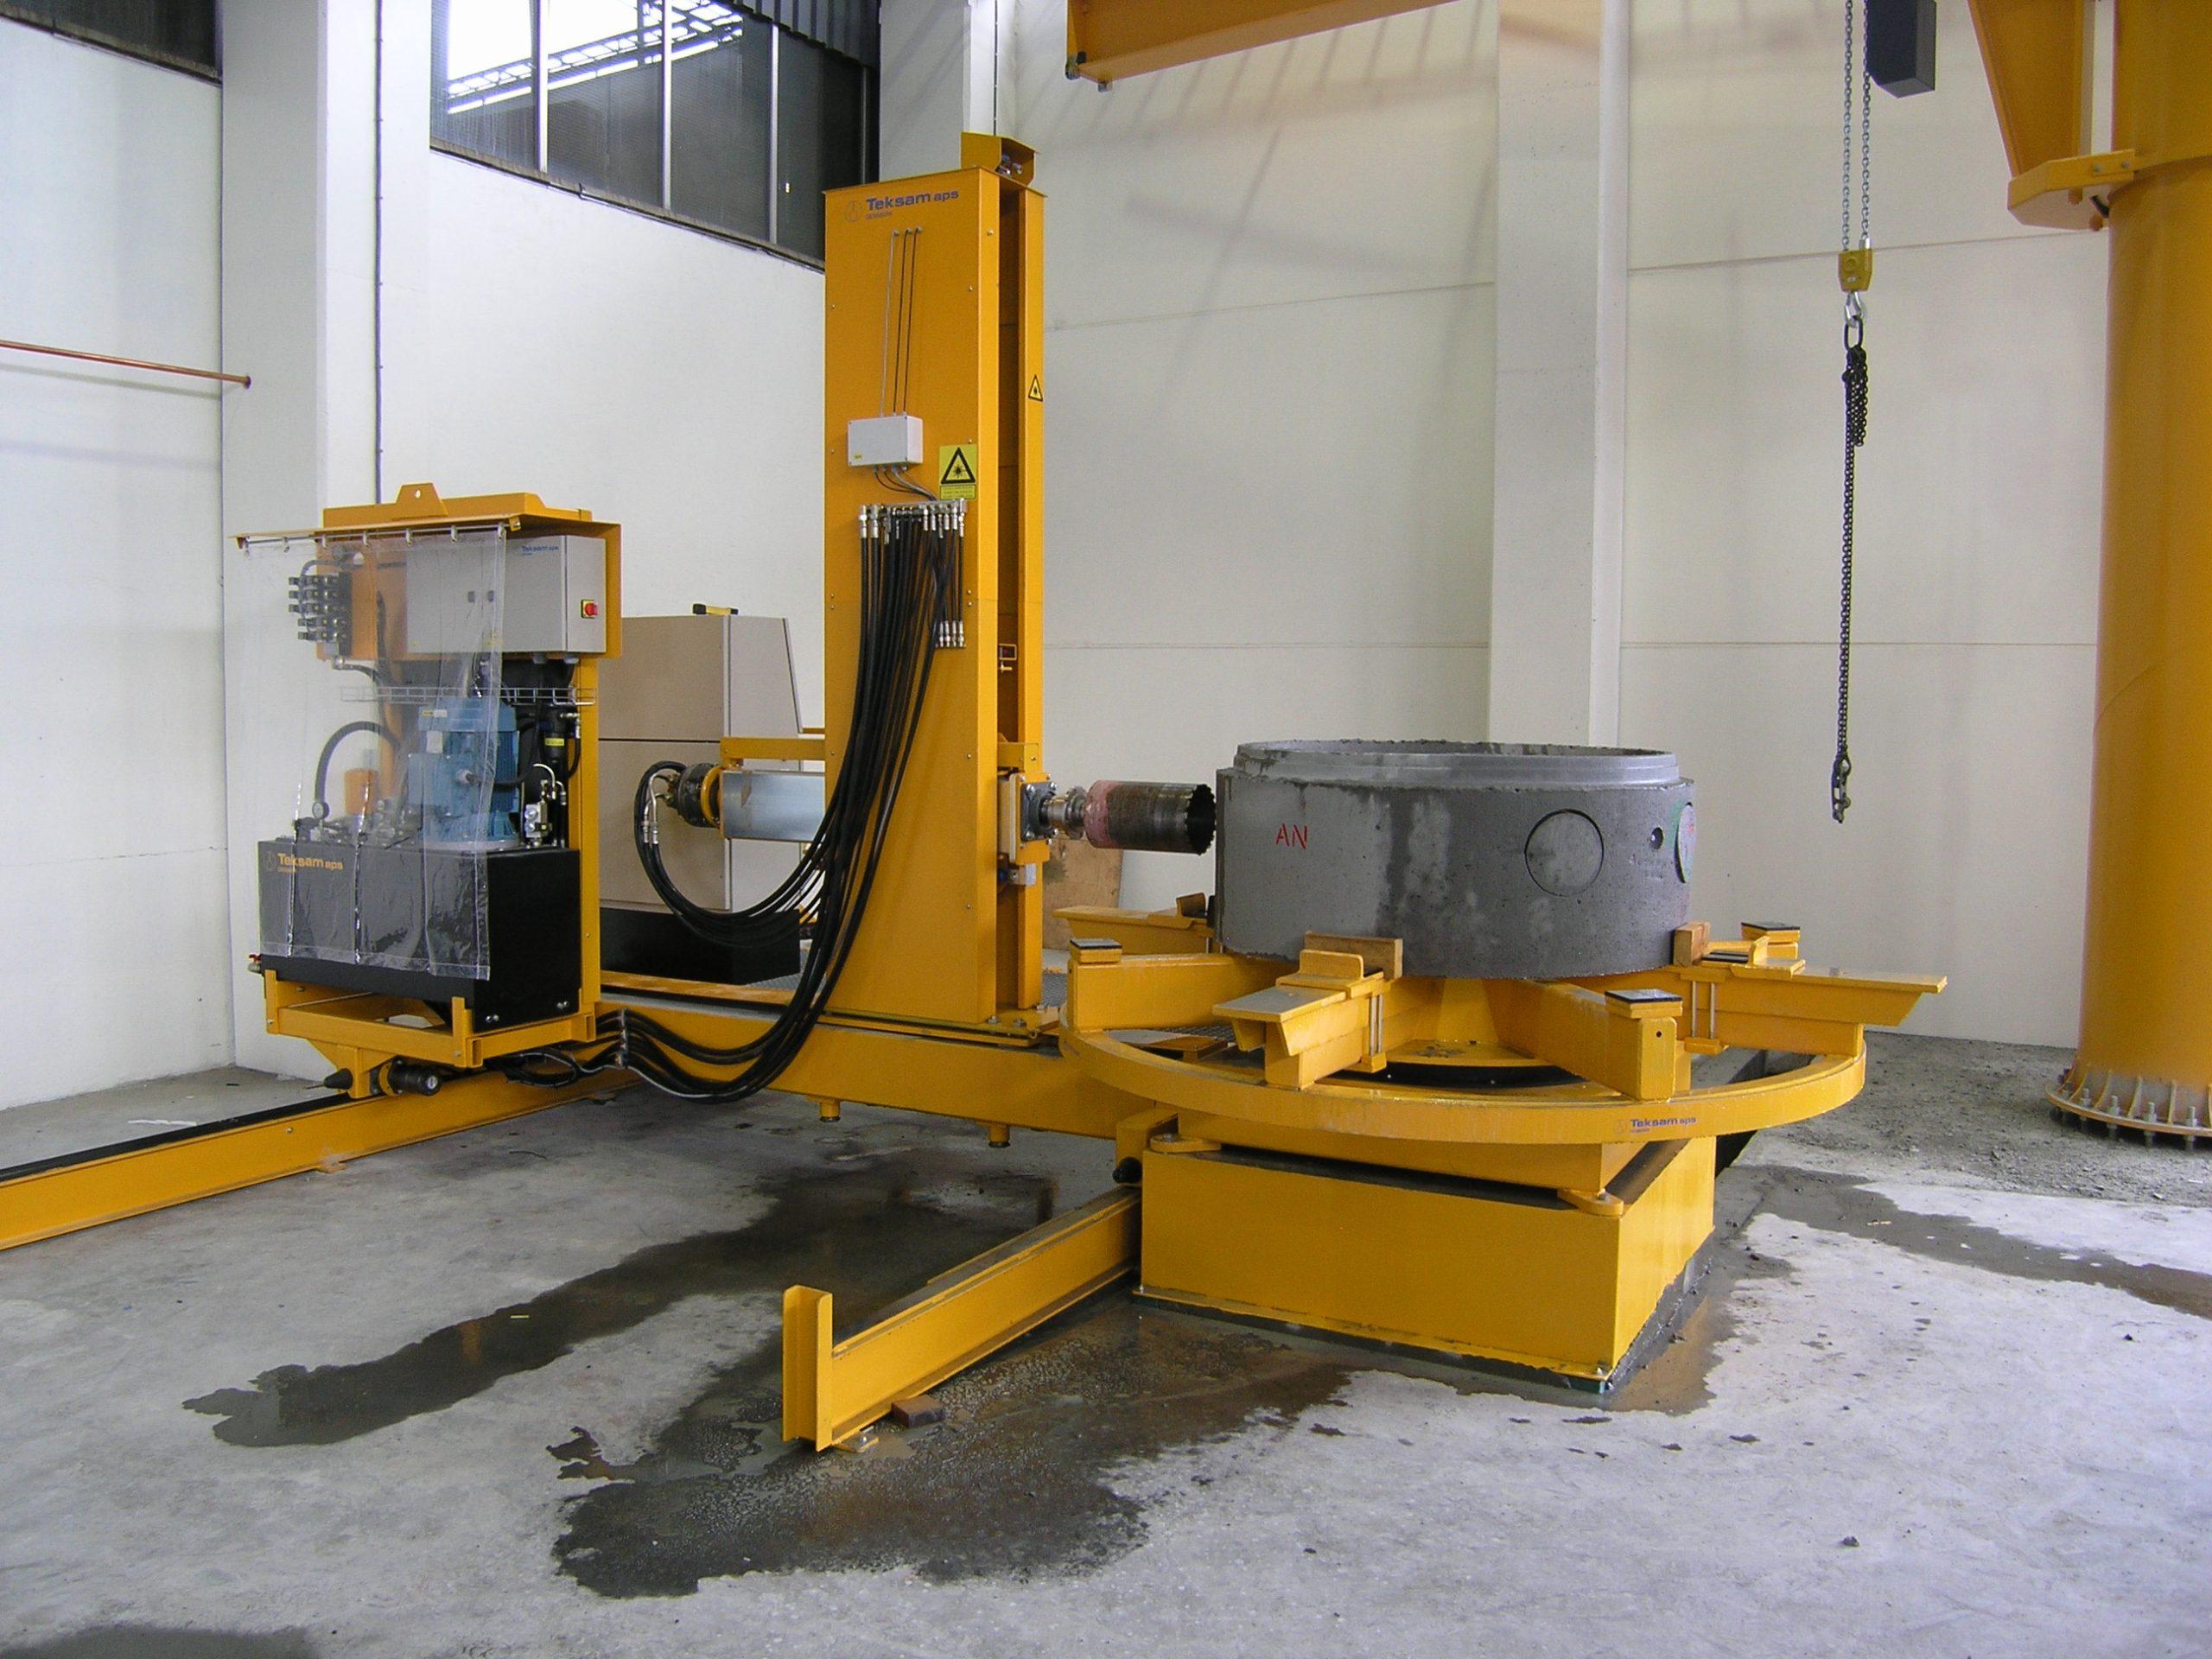 Concrete coring machine drilling holes